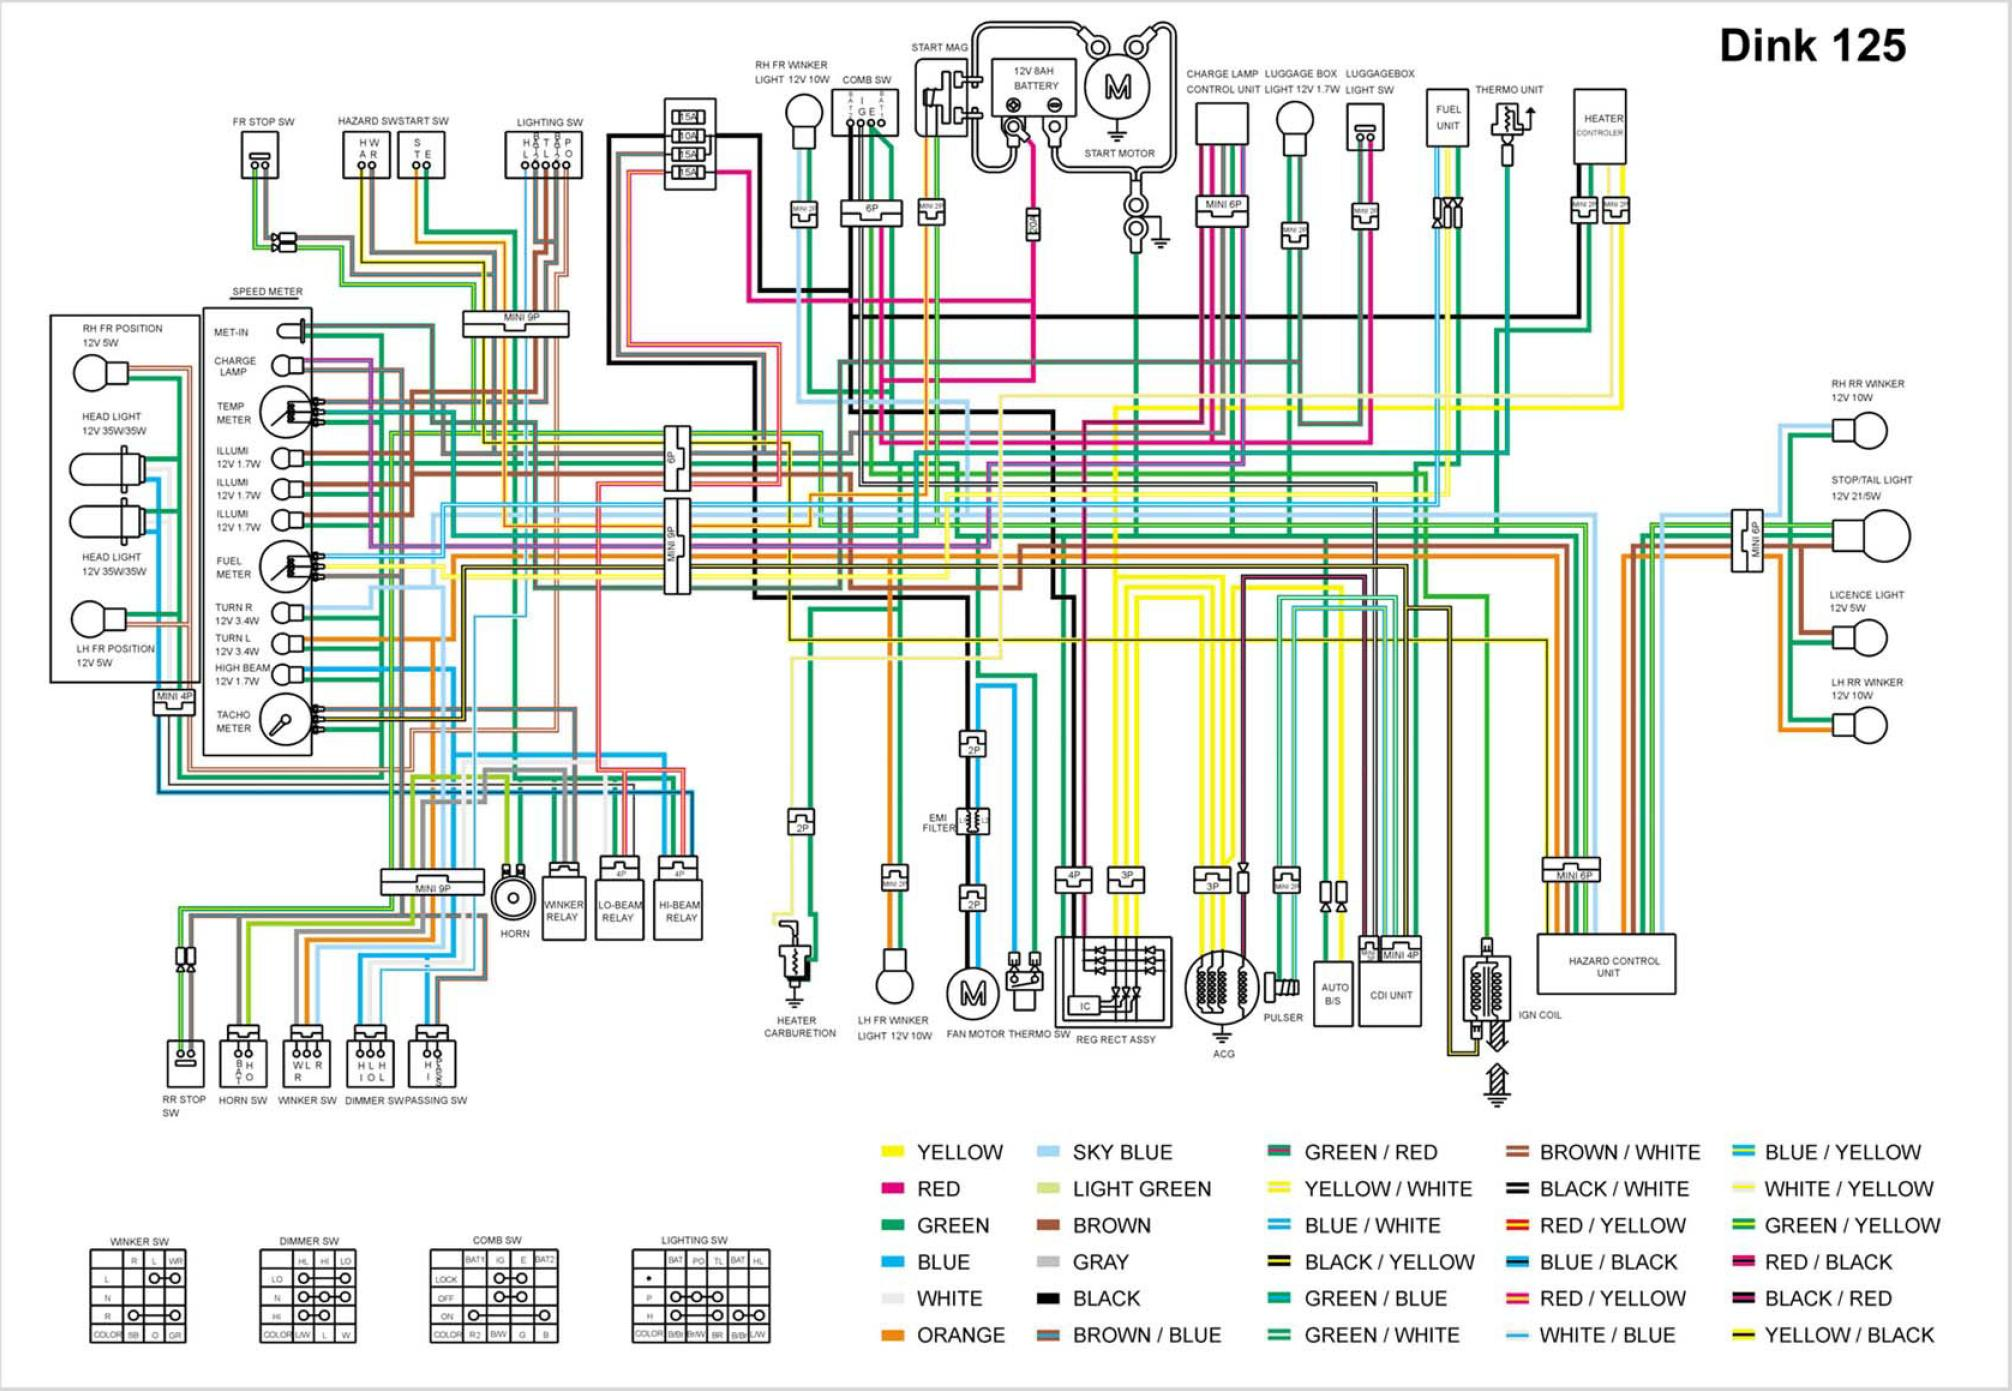 kymco motorcycle manuals pdf wiring diagrams fault codes rh motorcycle manual com 2014 Kymco Agility 125 2007 Kymco Agility 125